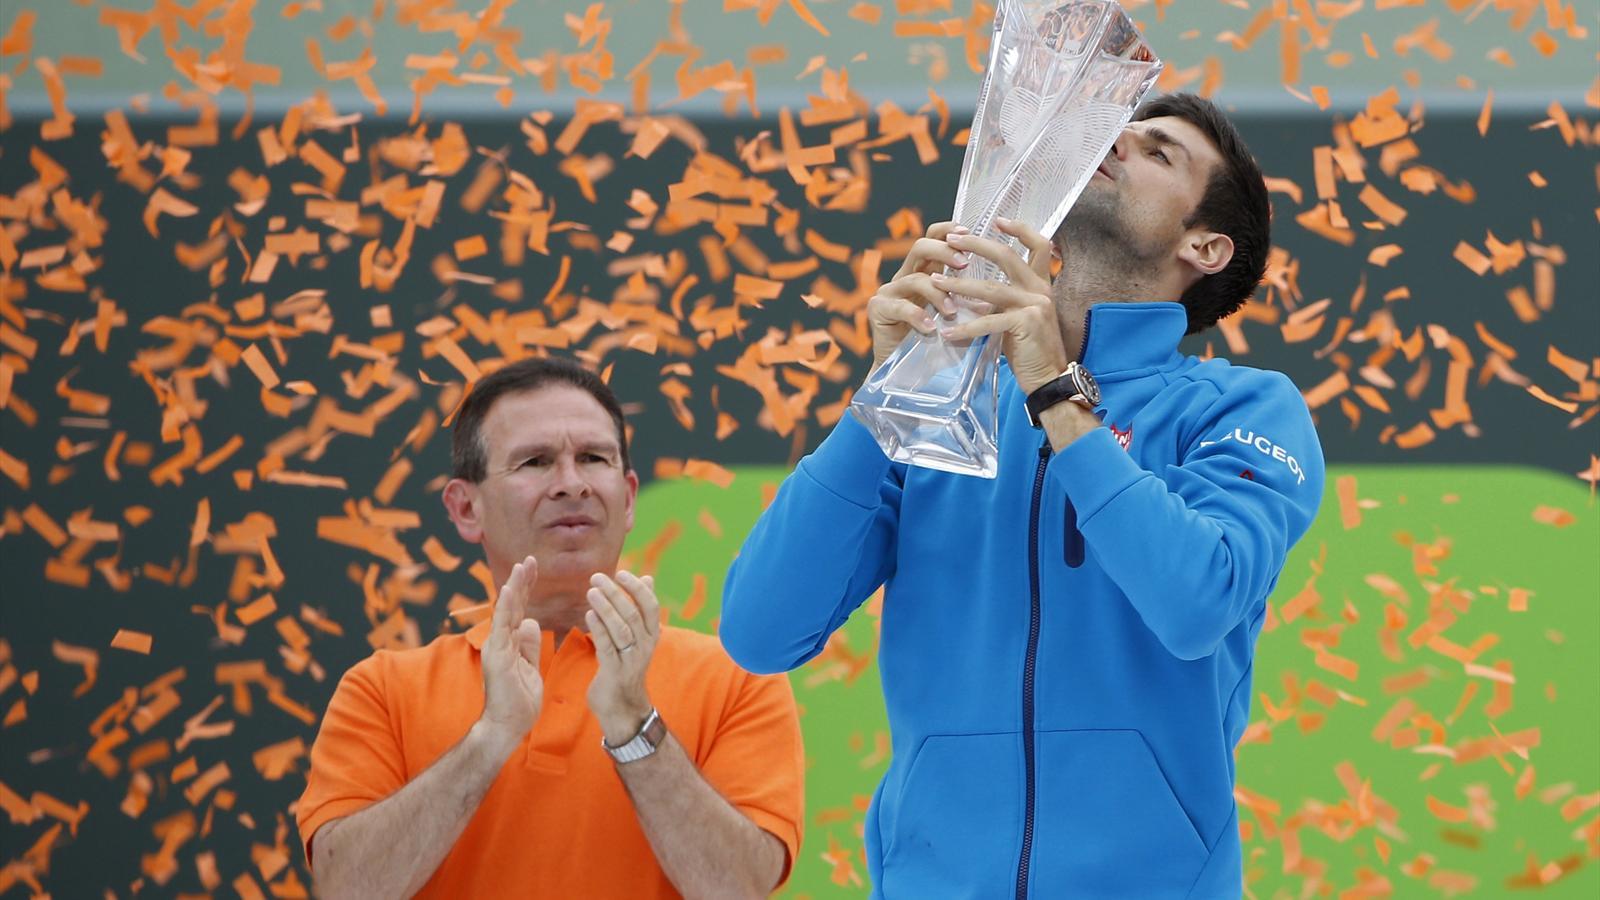 900 Novak Djokovic Cruises Kei Nishikori